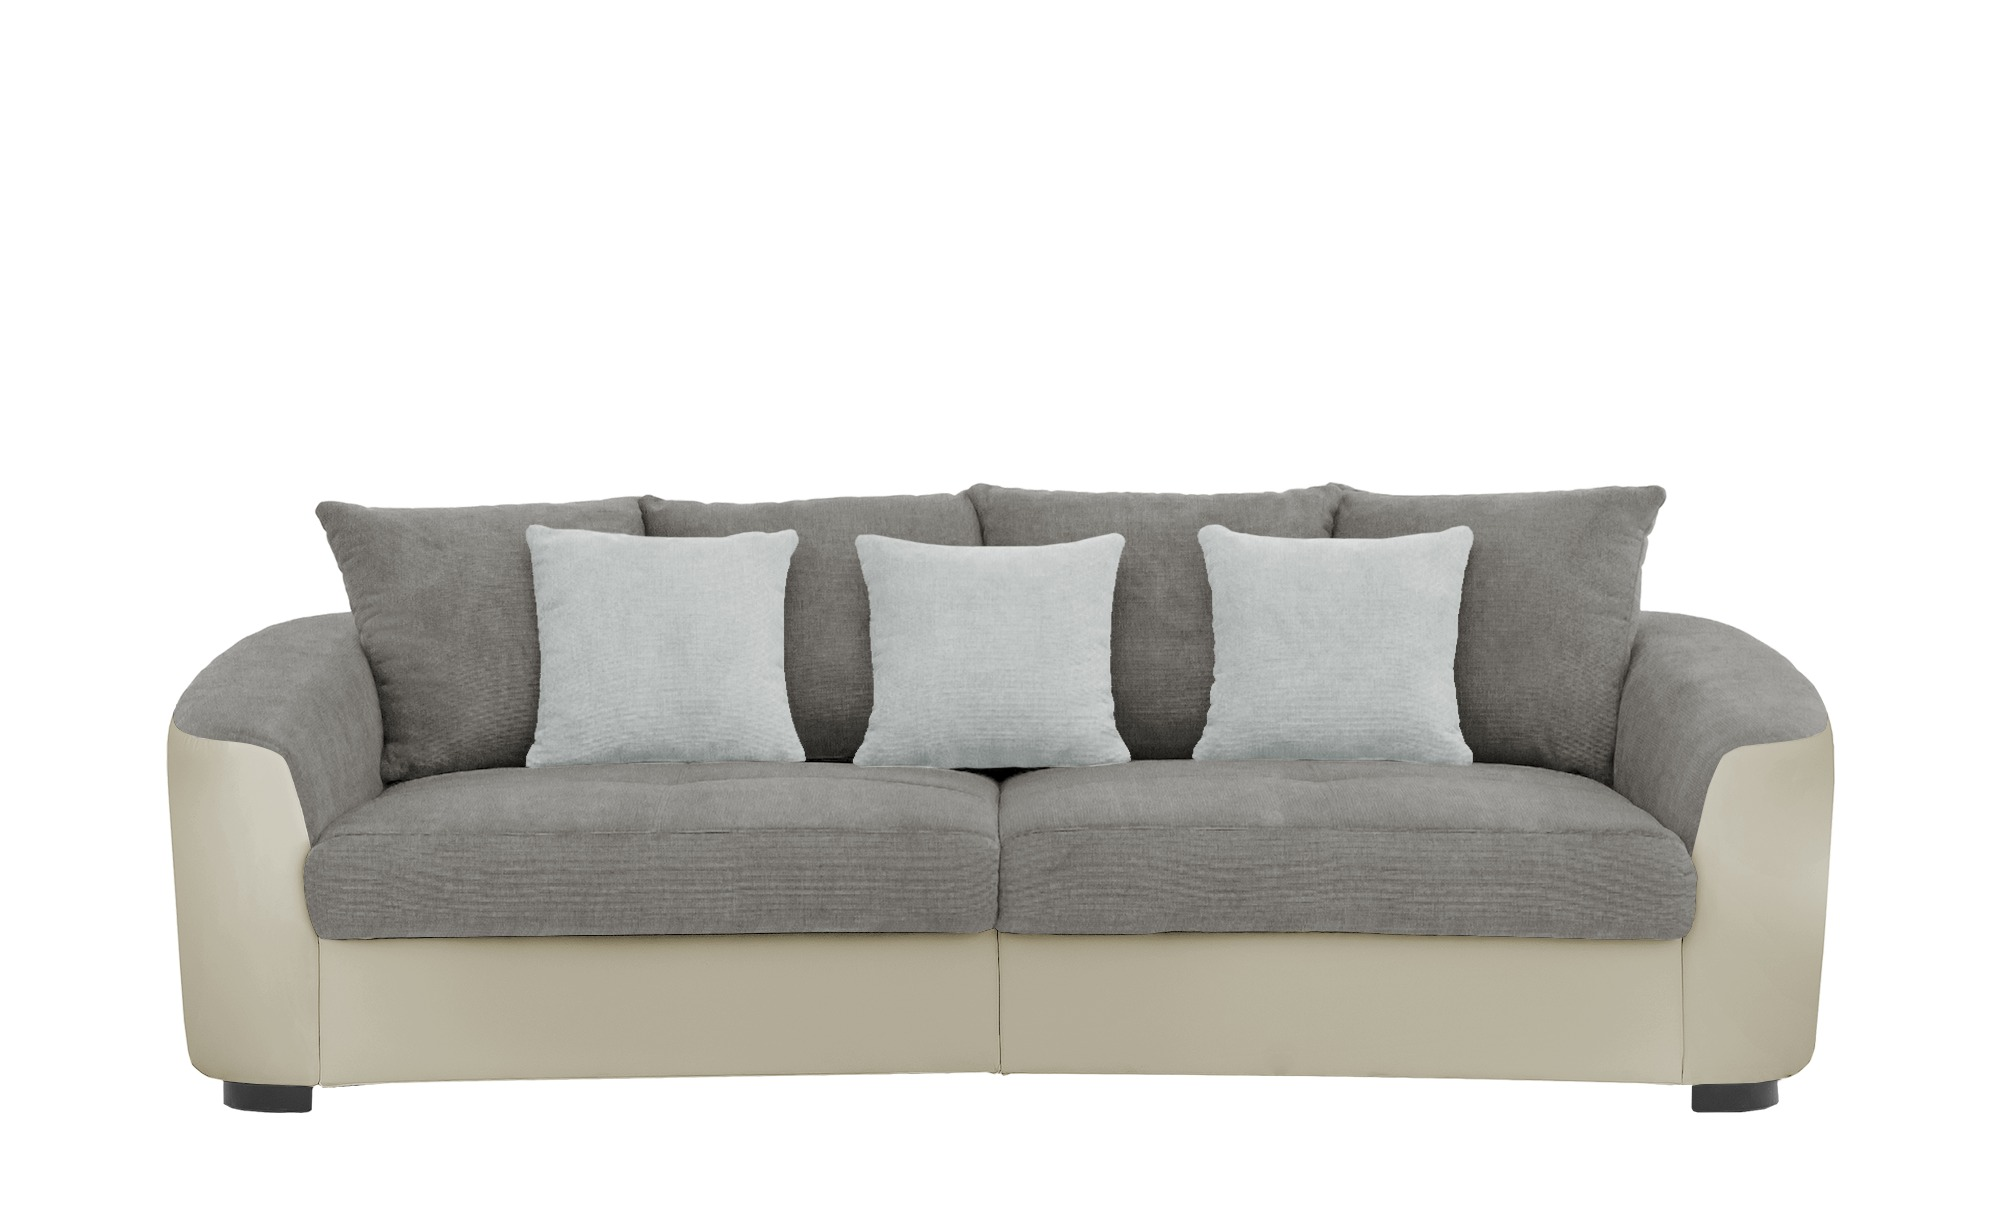 Big Sofa Cancuun, gefunden bei Möbel Höffner